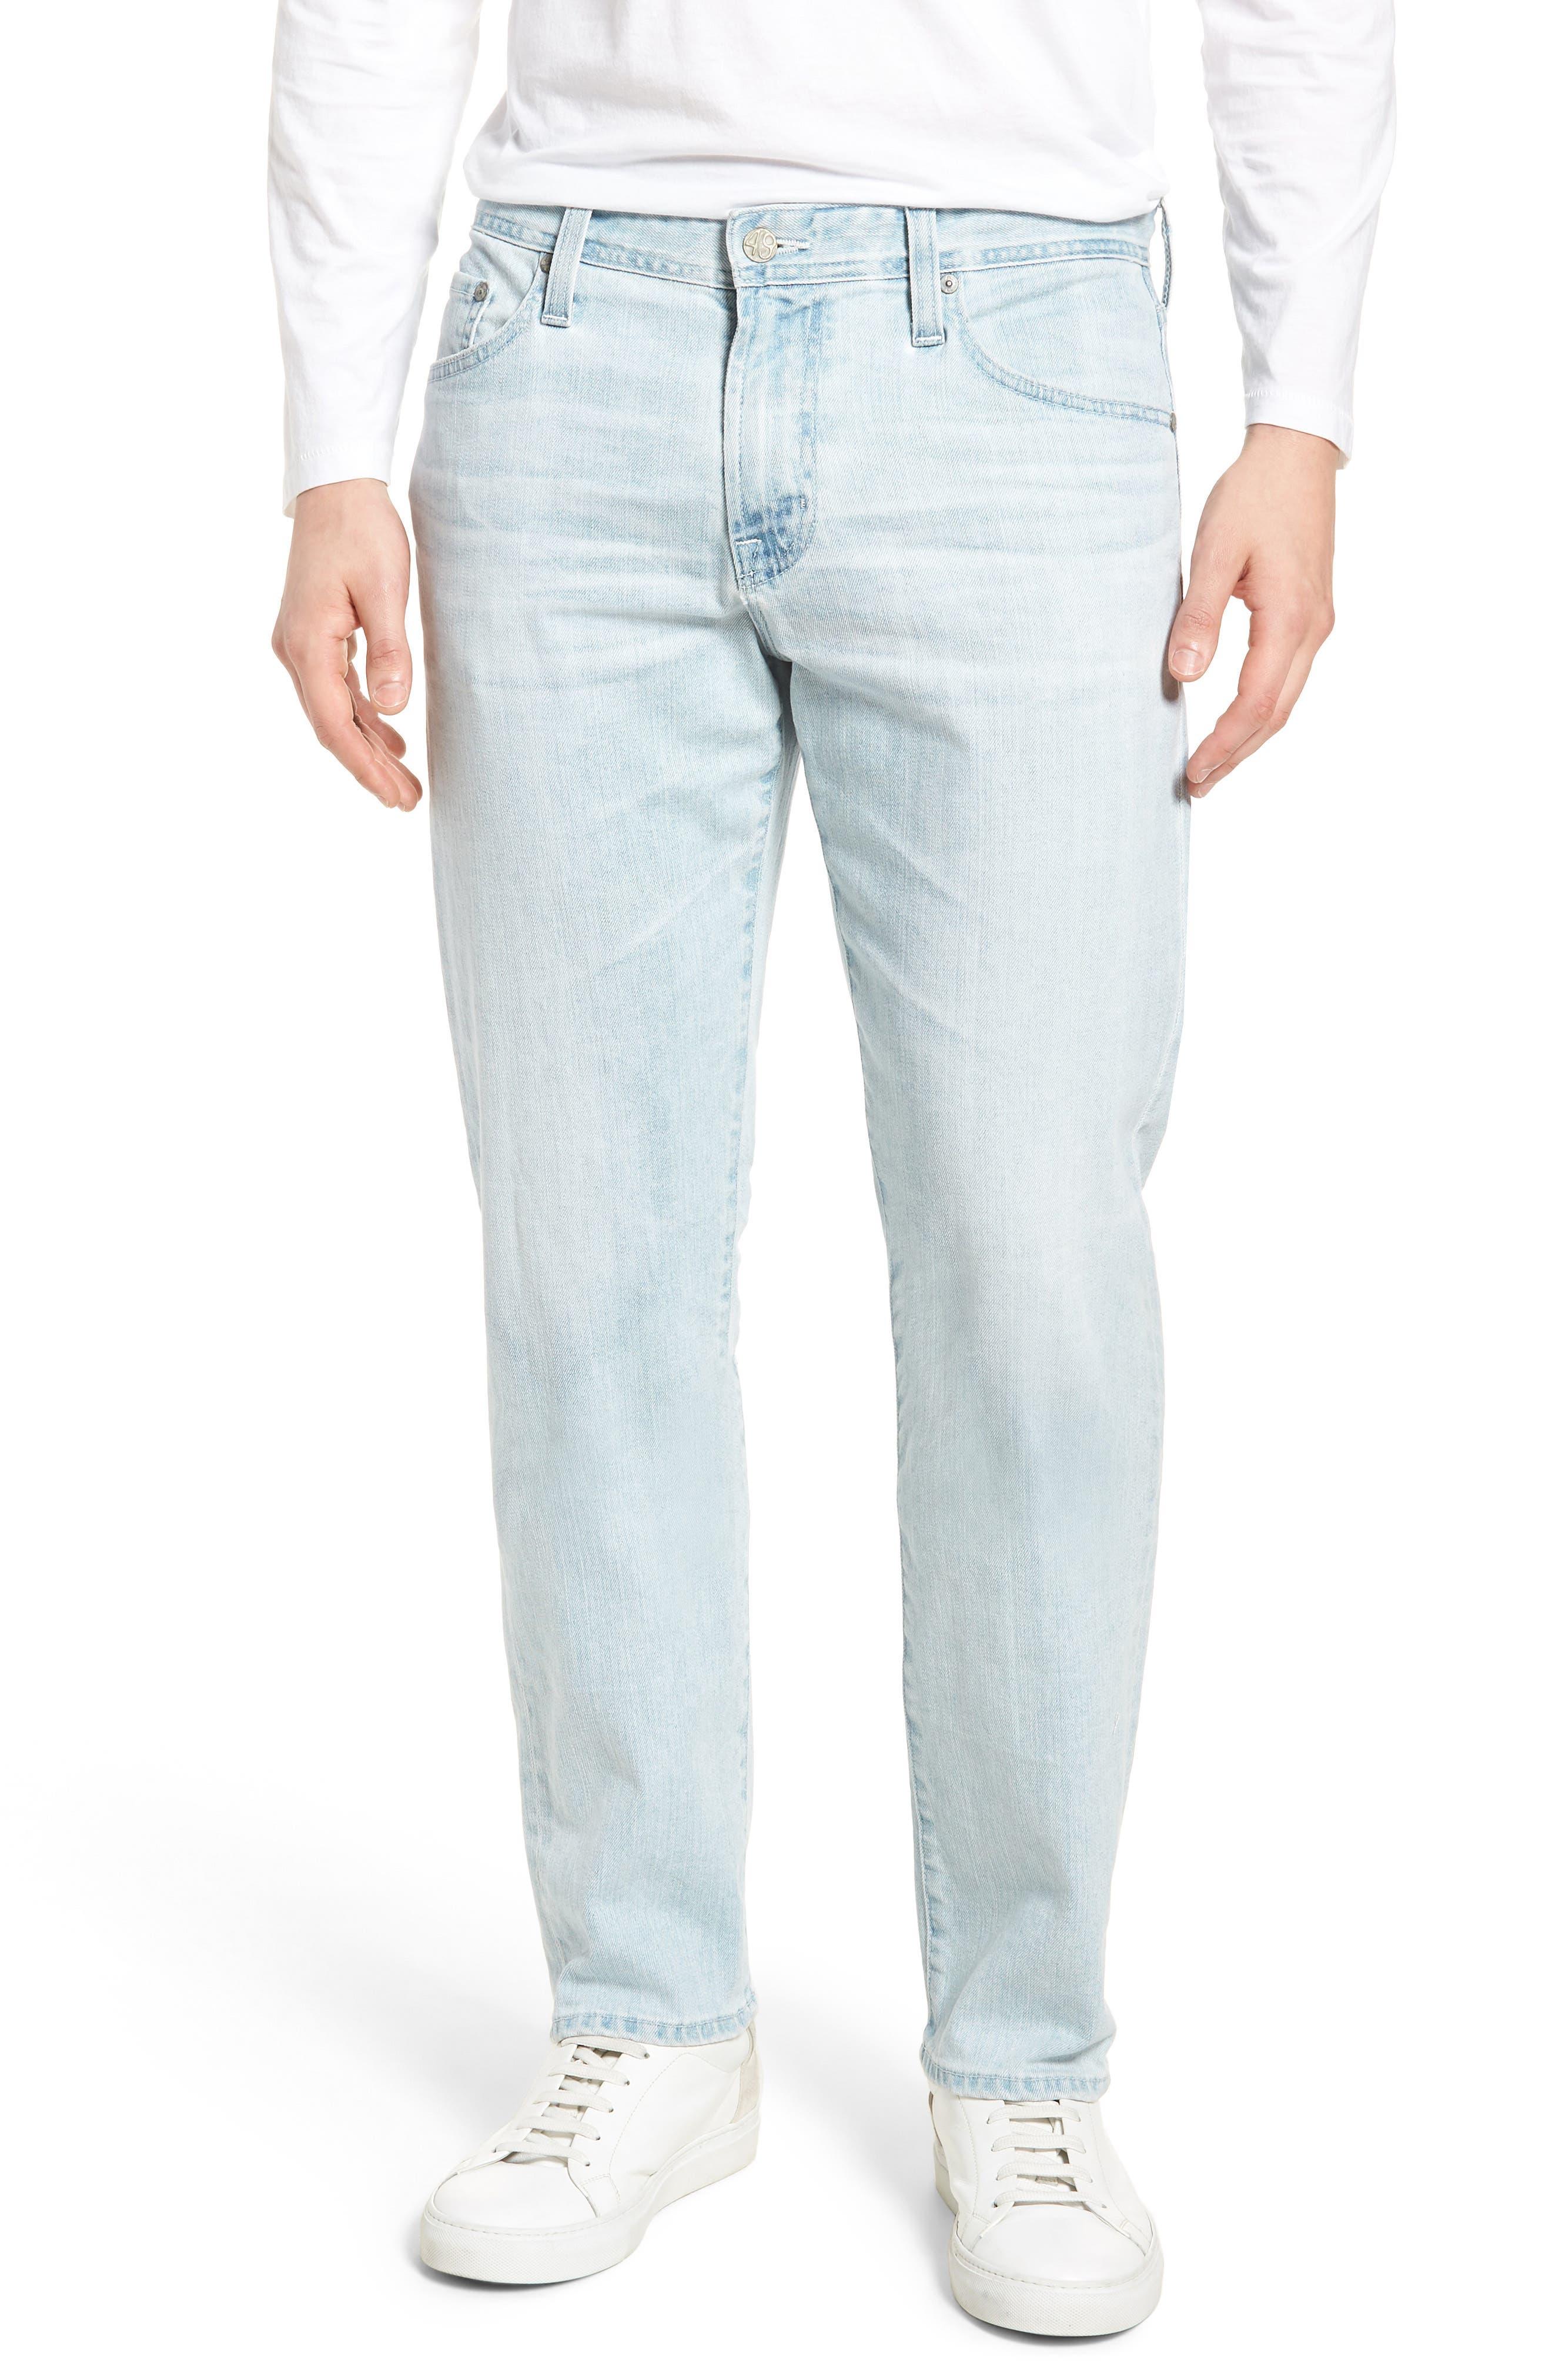 Alternate Image 1 Selected - AG Graduate Slim Straight Leg Jeans (27 Years Bayside)